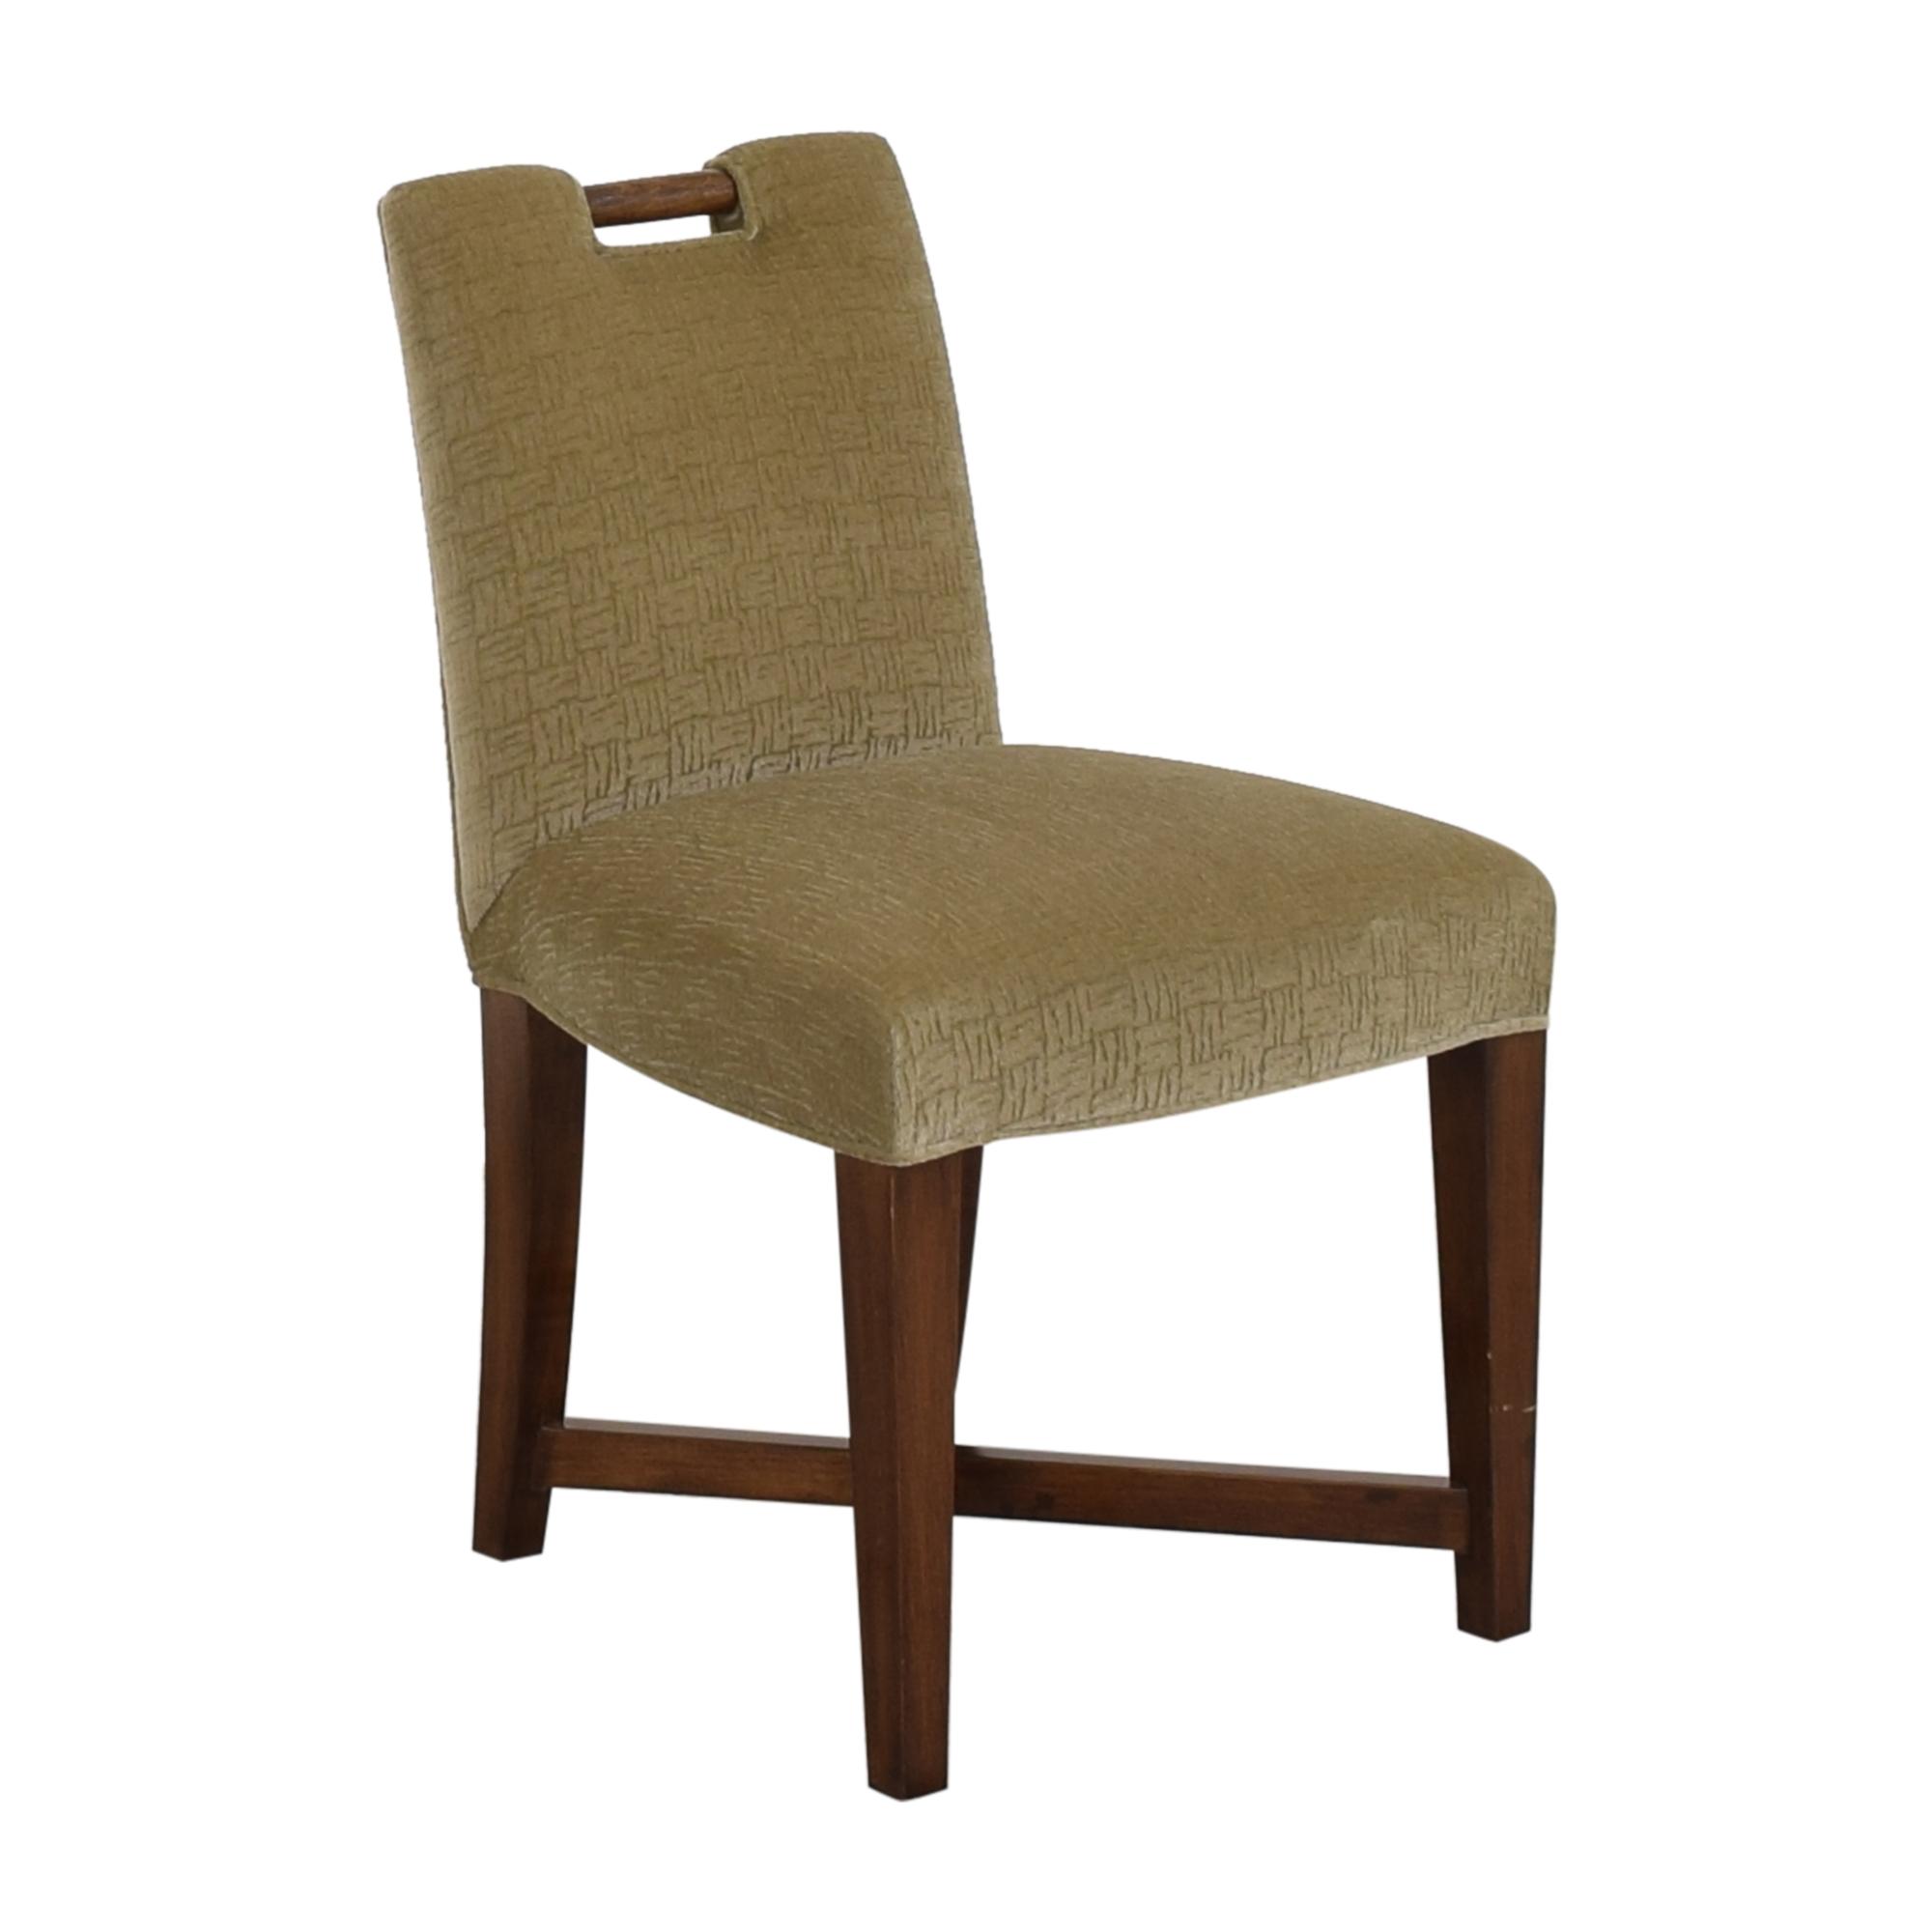 Donghia Donghia Custom Upholstered Chair ct